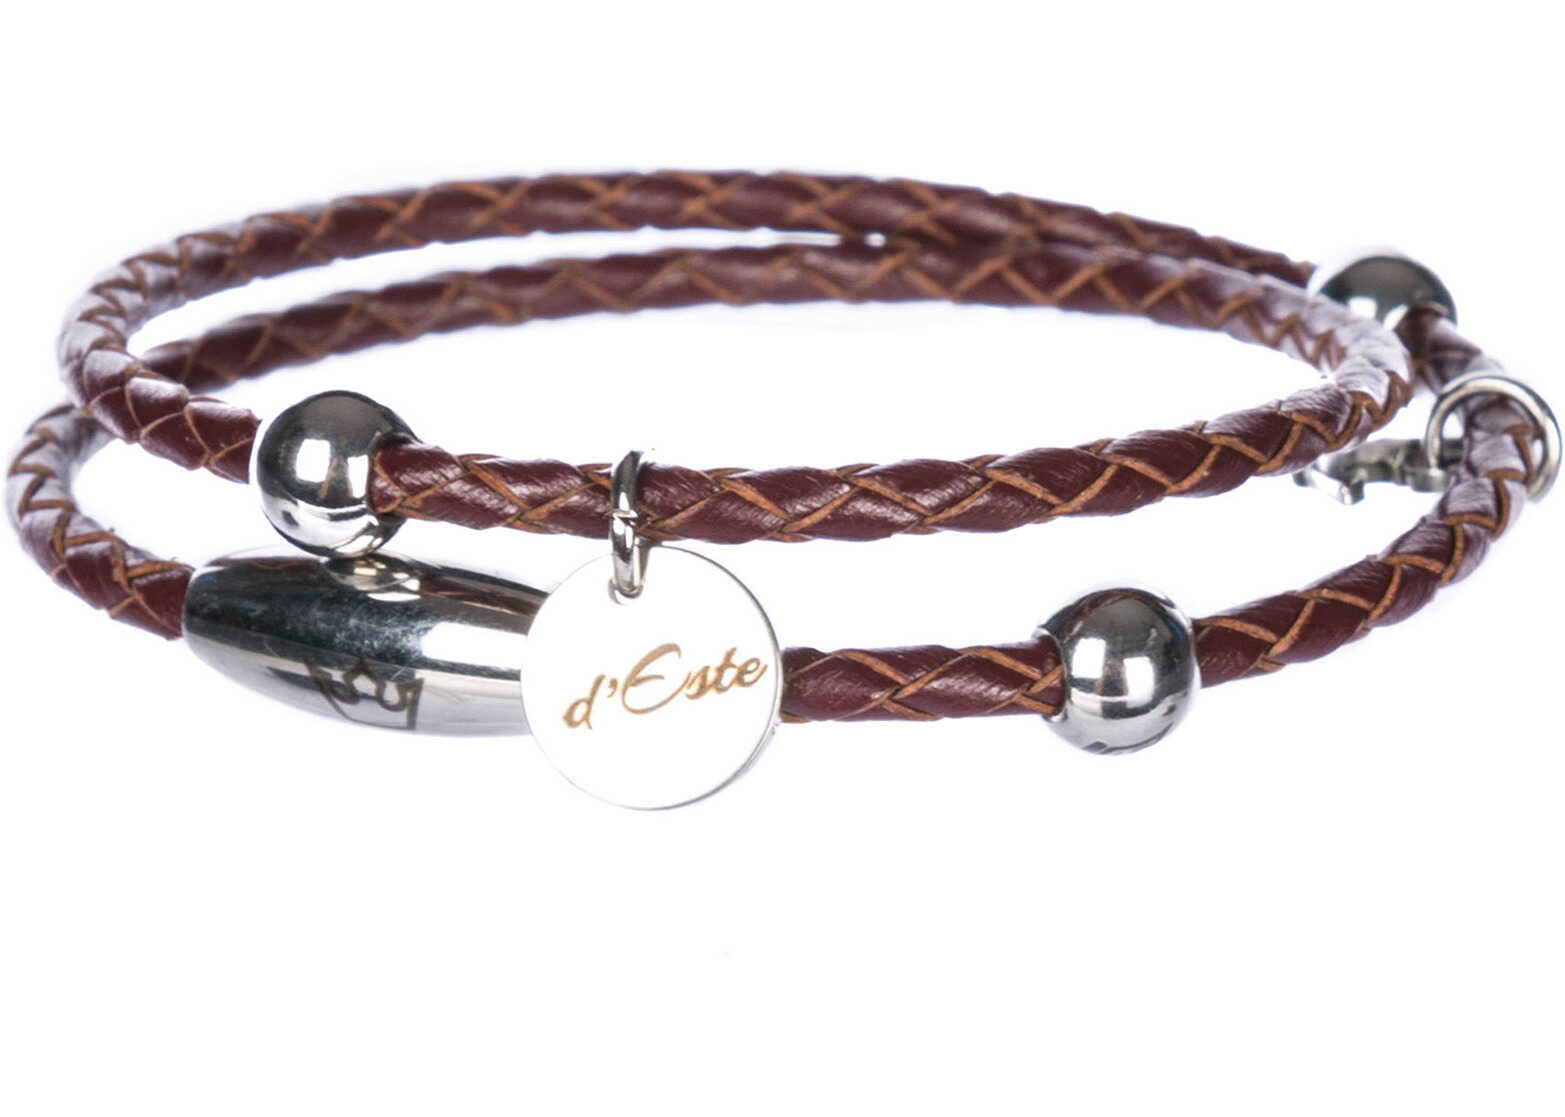 d'Este Leather Bracelet Brown